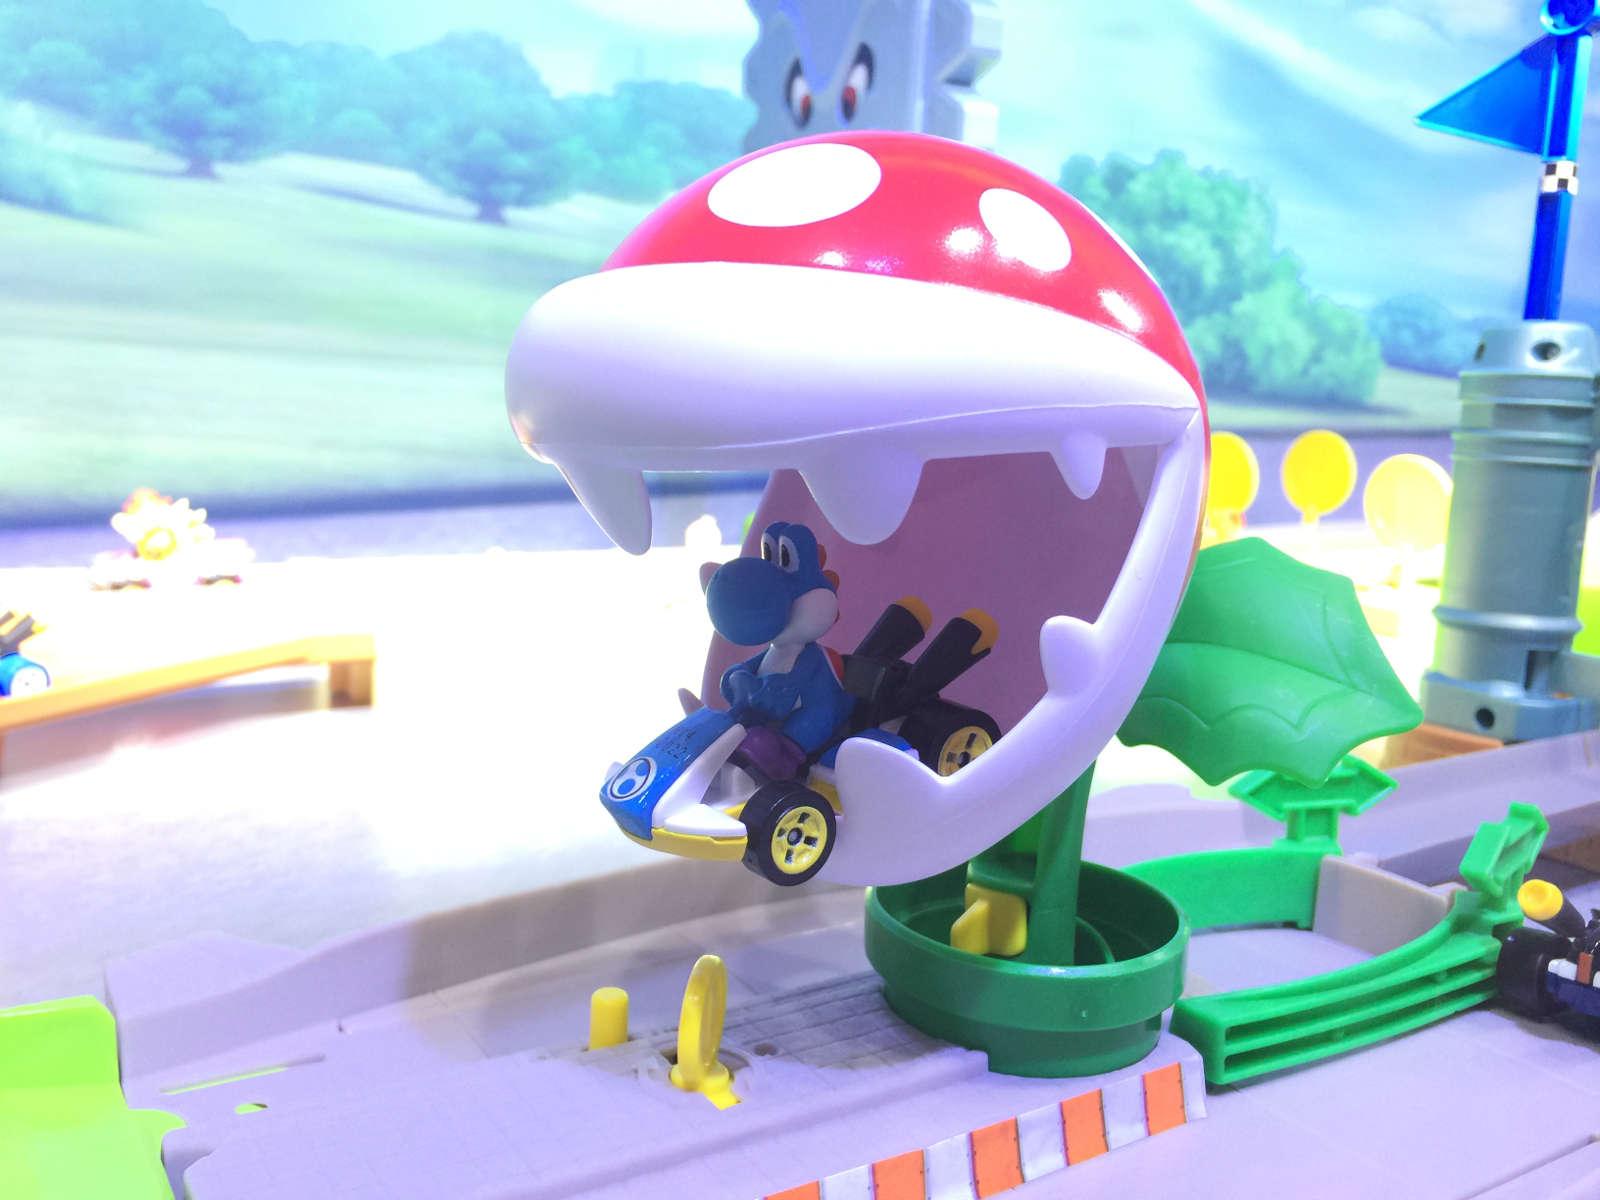 The Mario Kart Hot Wheels Are Great Fbtb